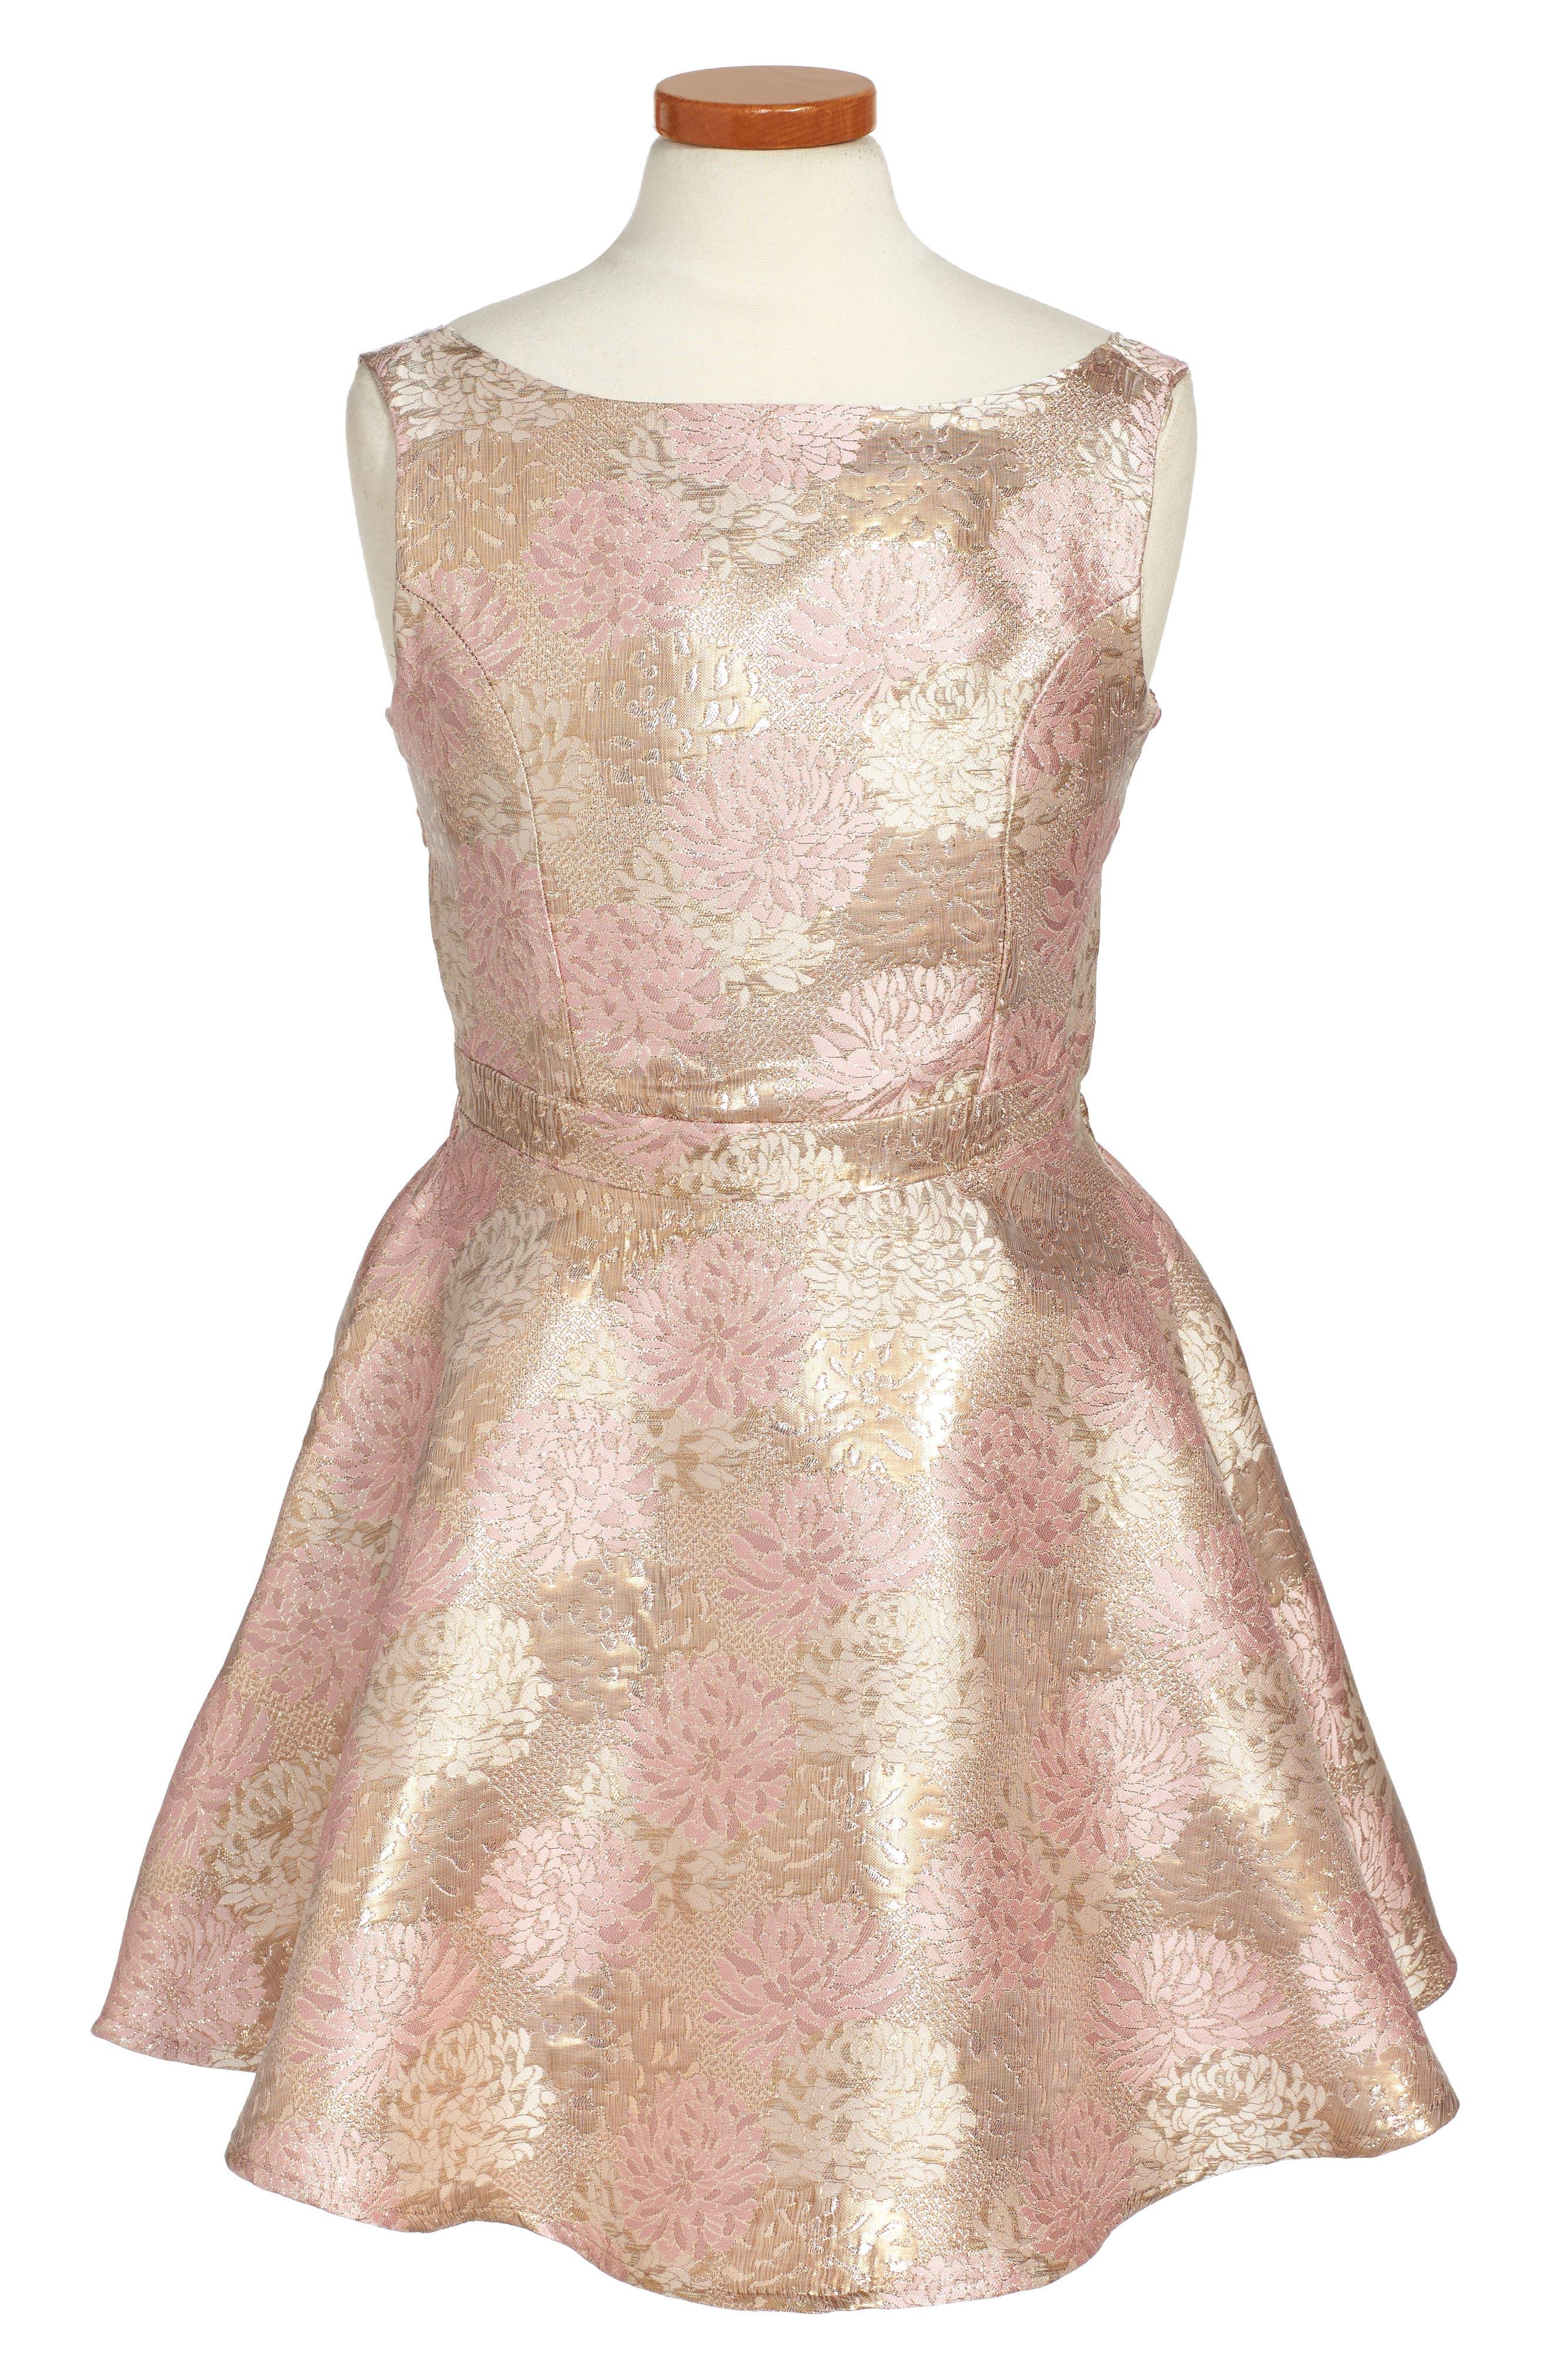 Alternate Image 1 Selected - Un Deux Trois Floral Jacquard Skater Dress (Big Girls)